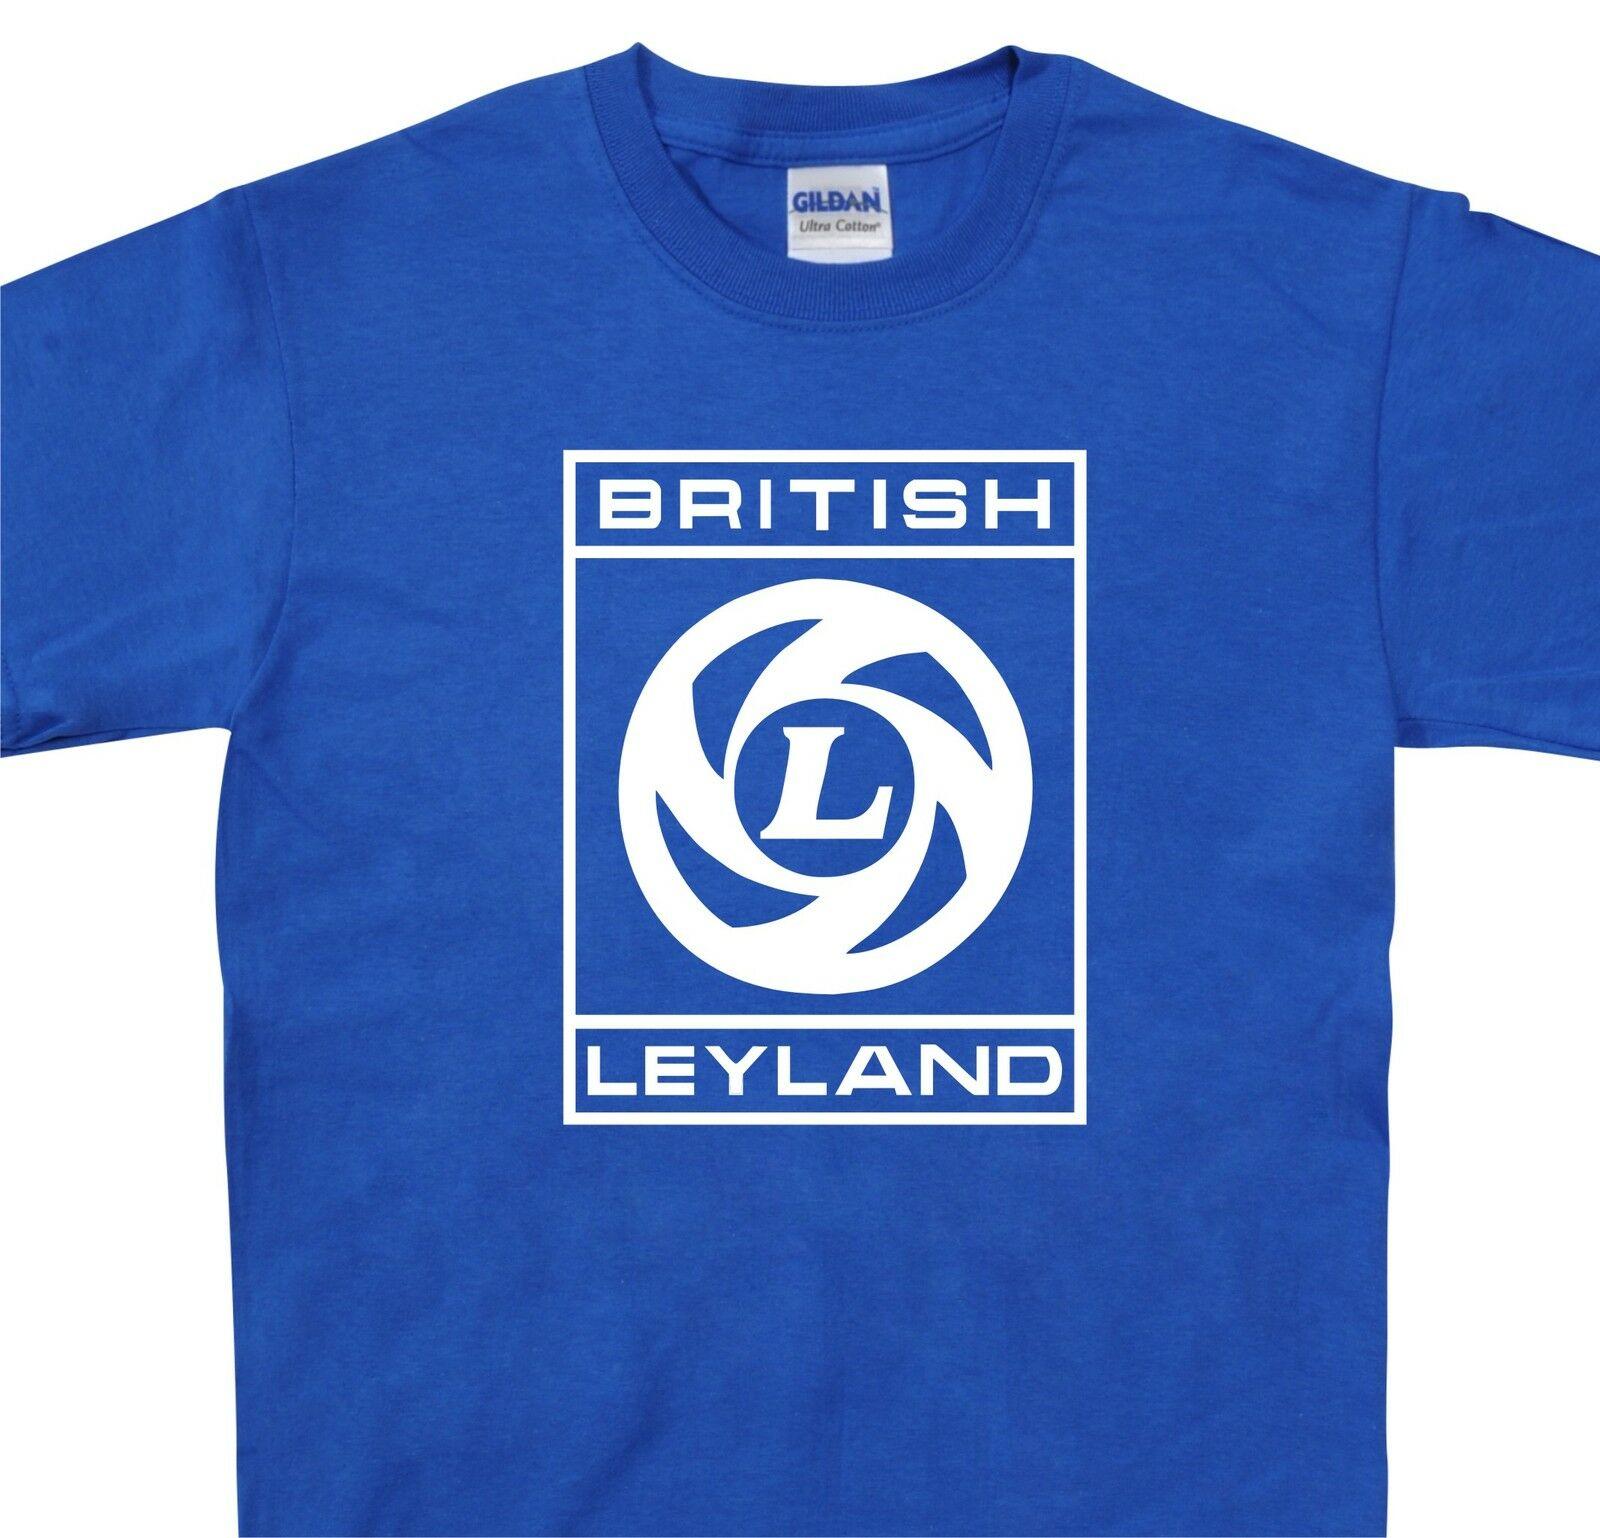 Britânico leyland t camisa mini metro austin princesa allegro marina até 5xl tamanho